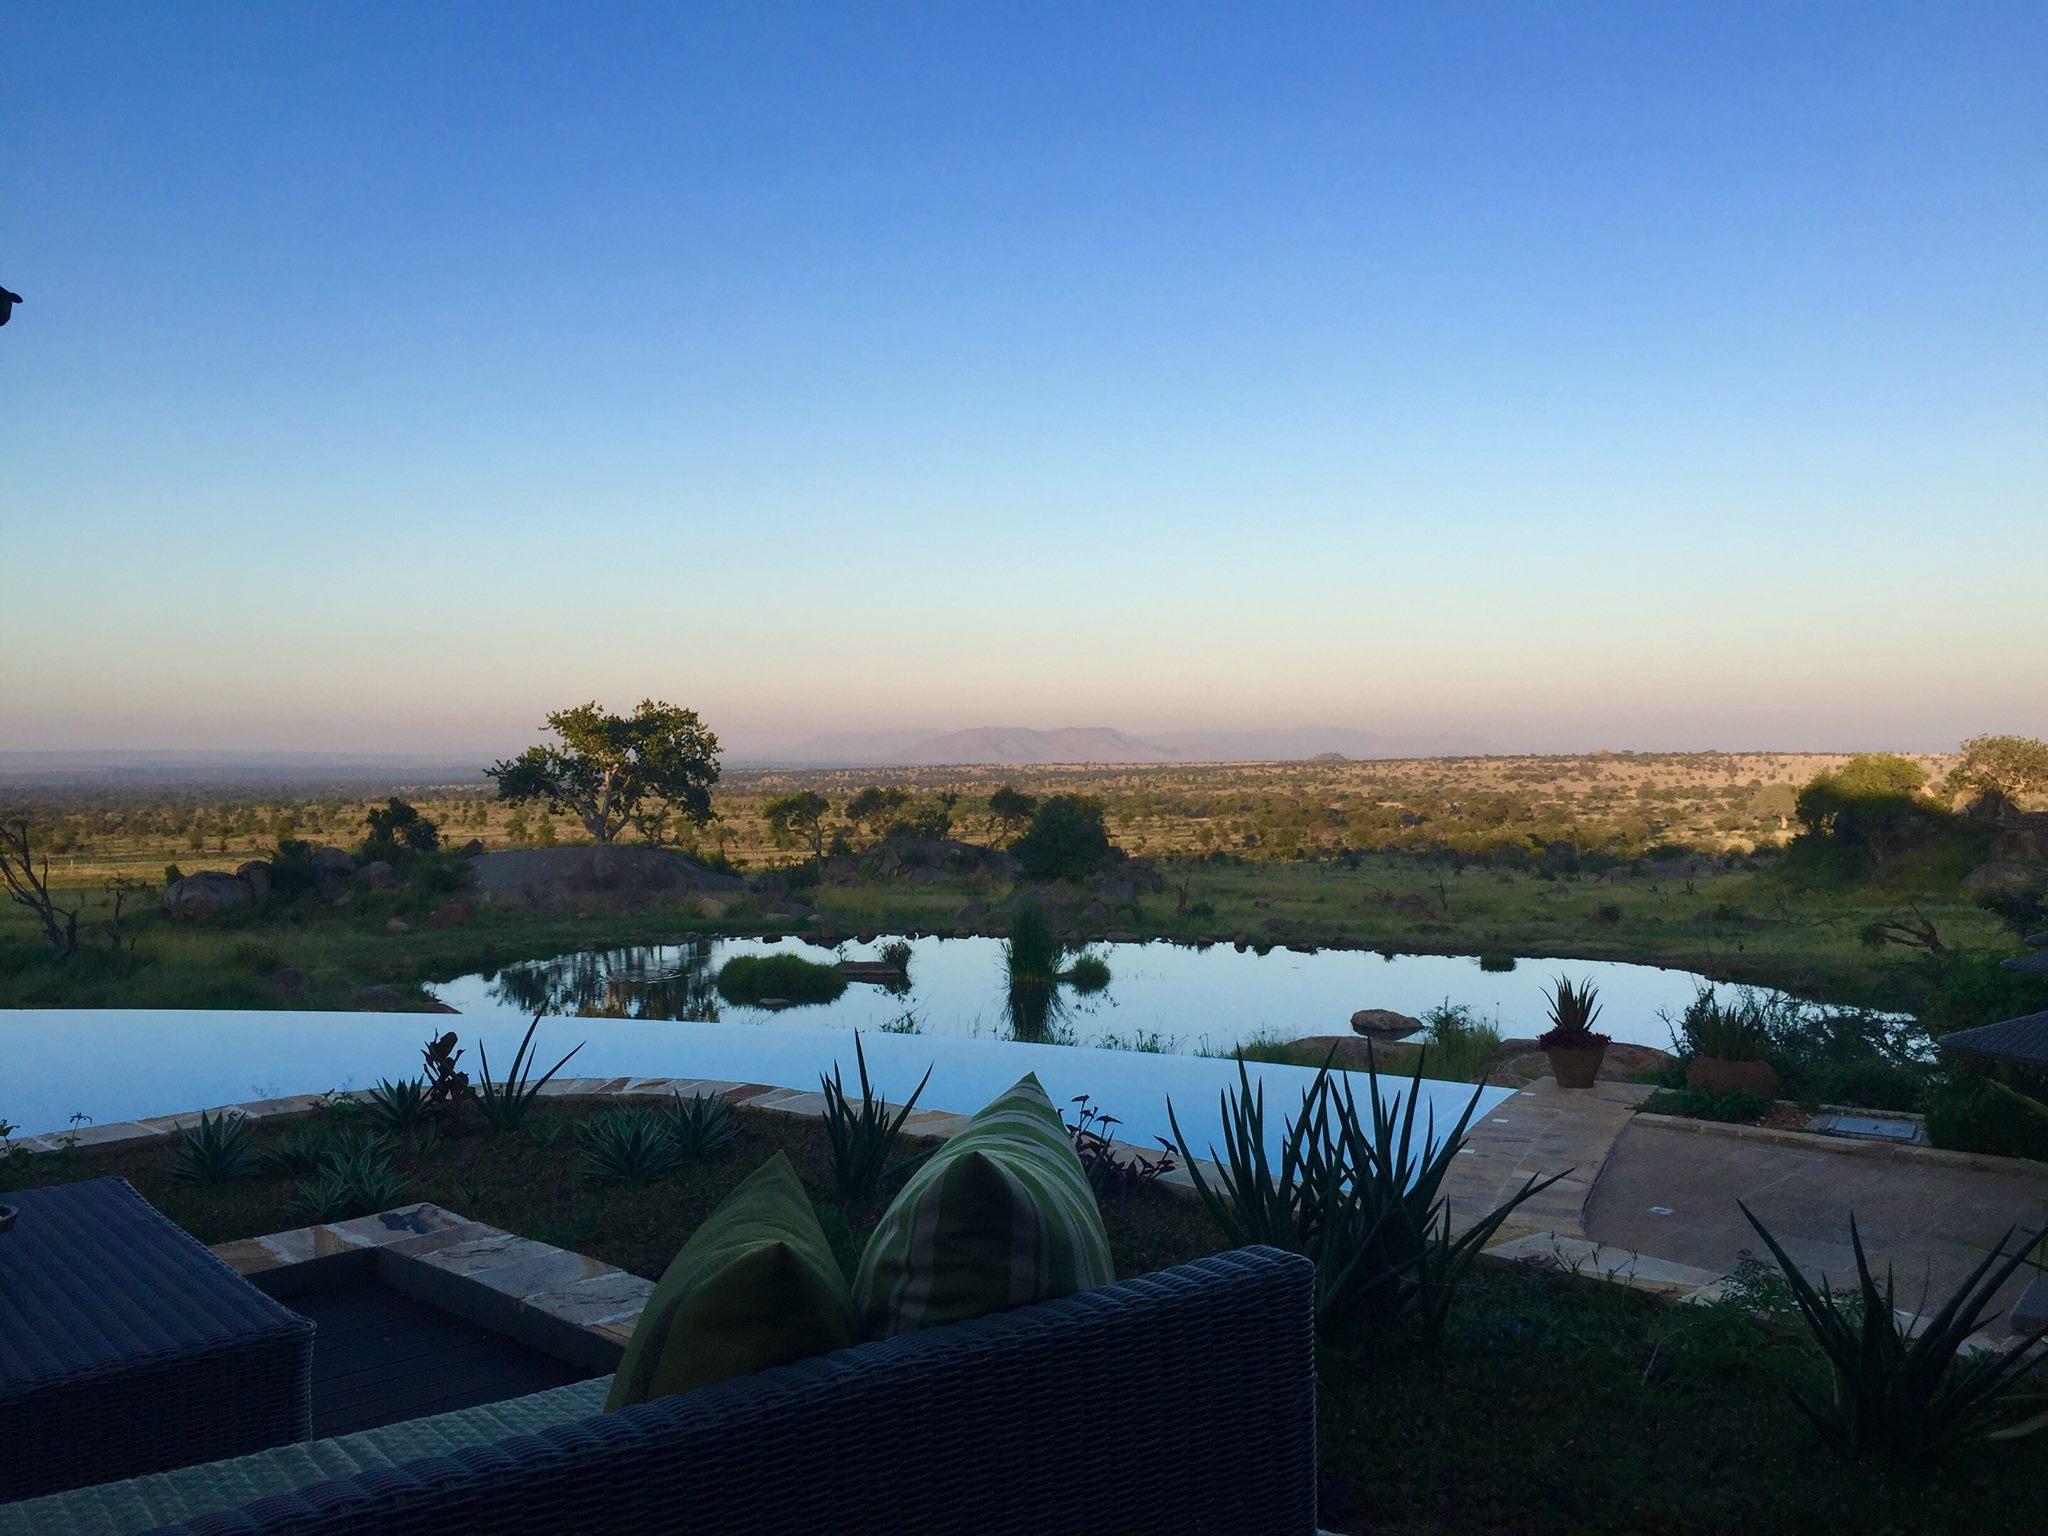 Luxury Travel Tanzania - Four Seasons Serengeti Lodge